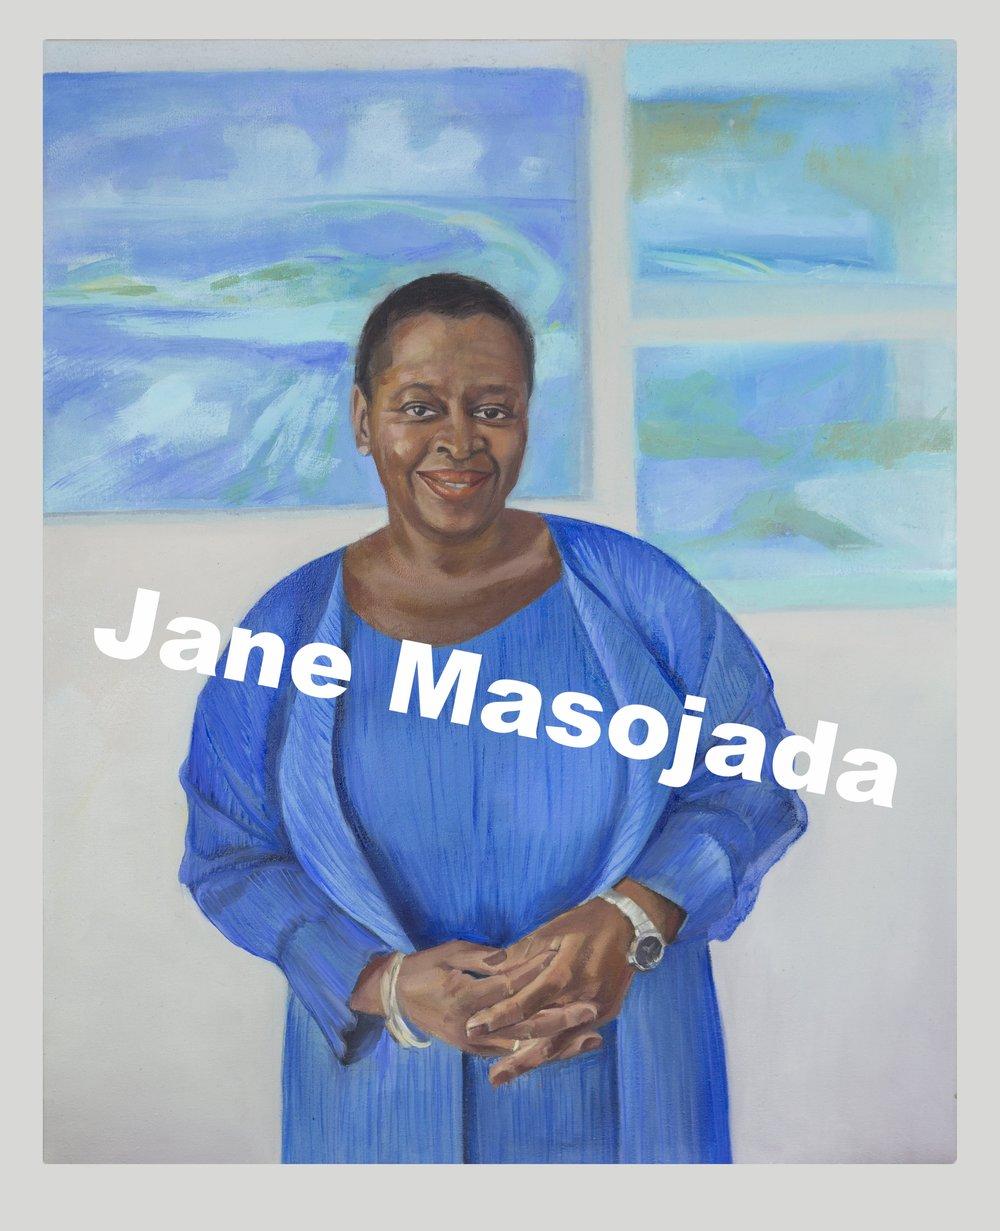 Jane Masojada Bermuda-2018-04-09-7897M.jpg